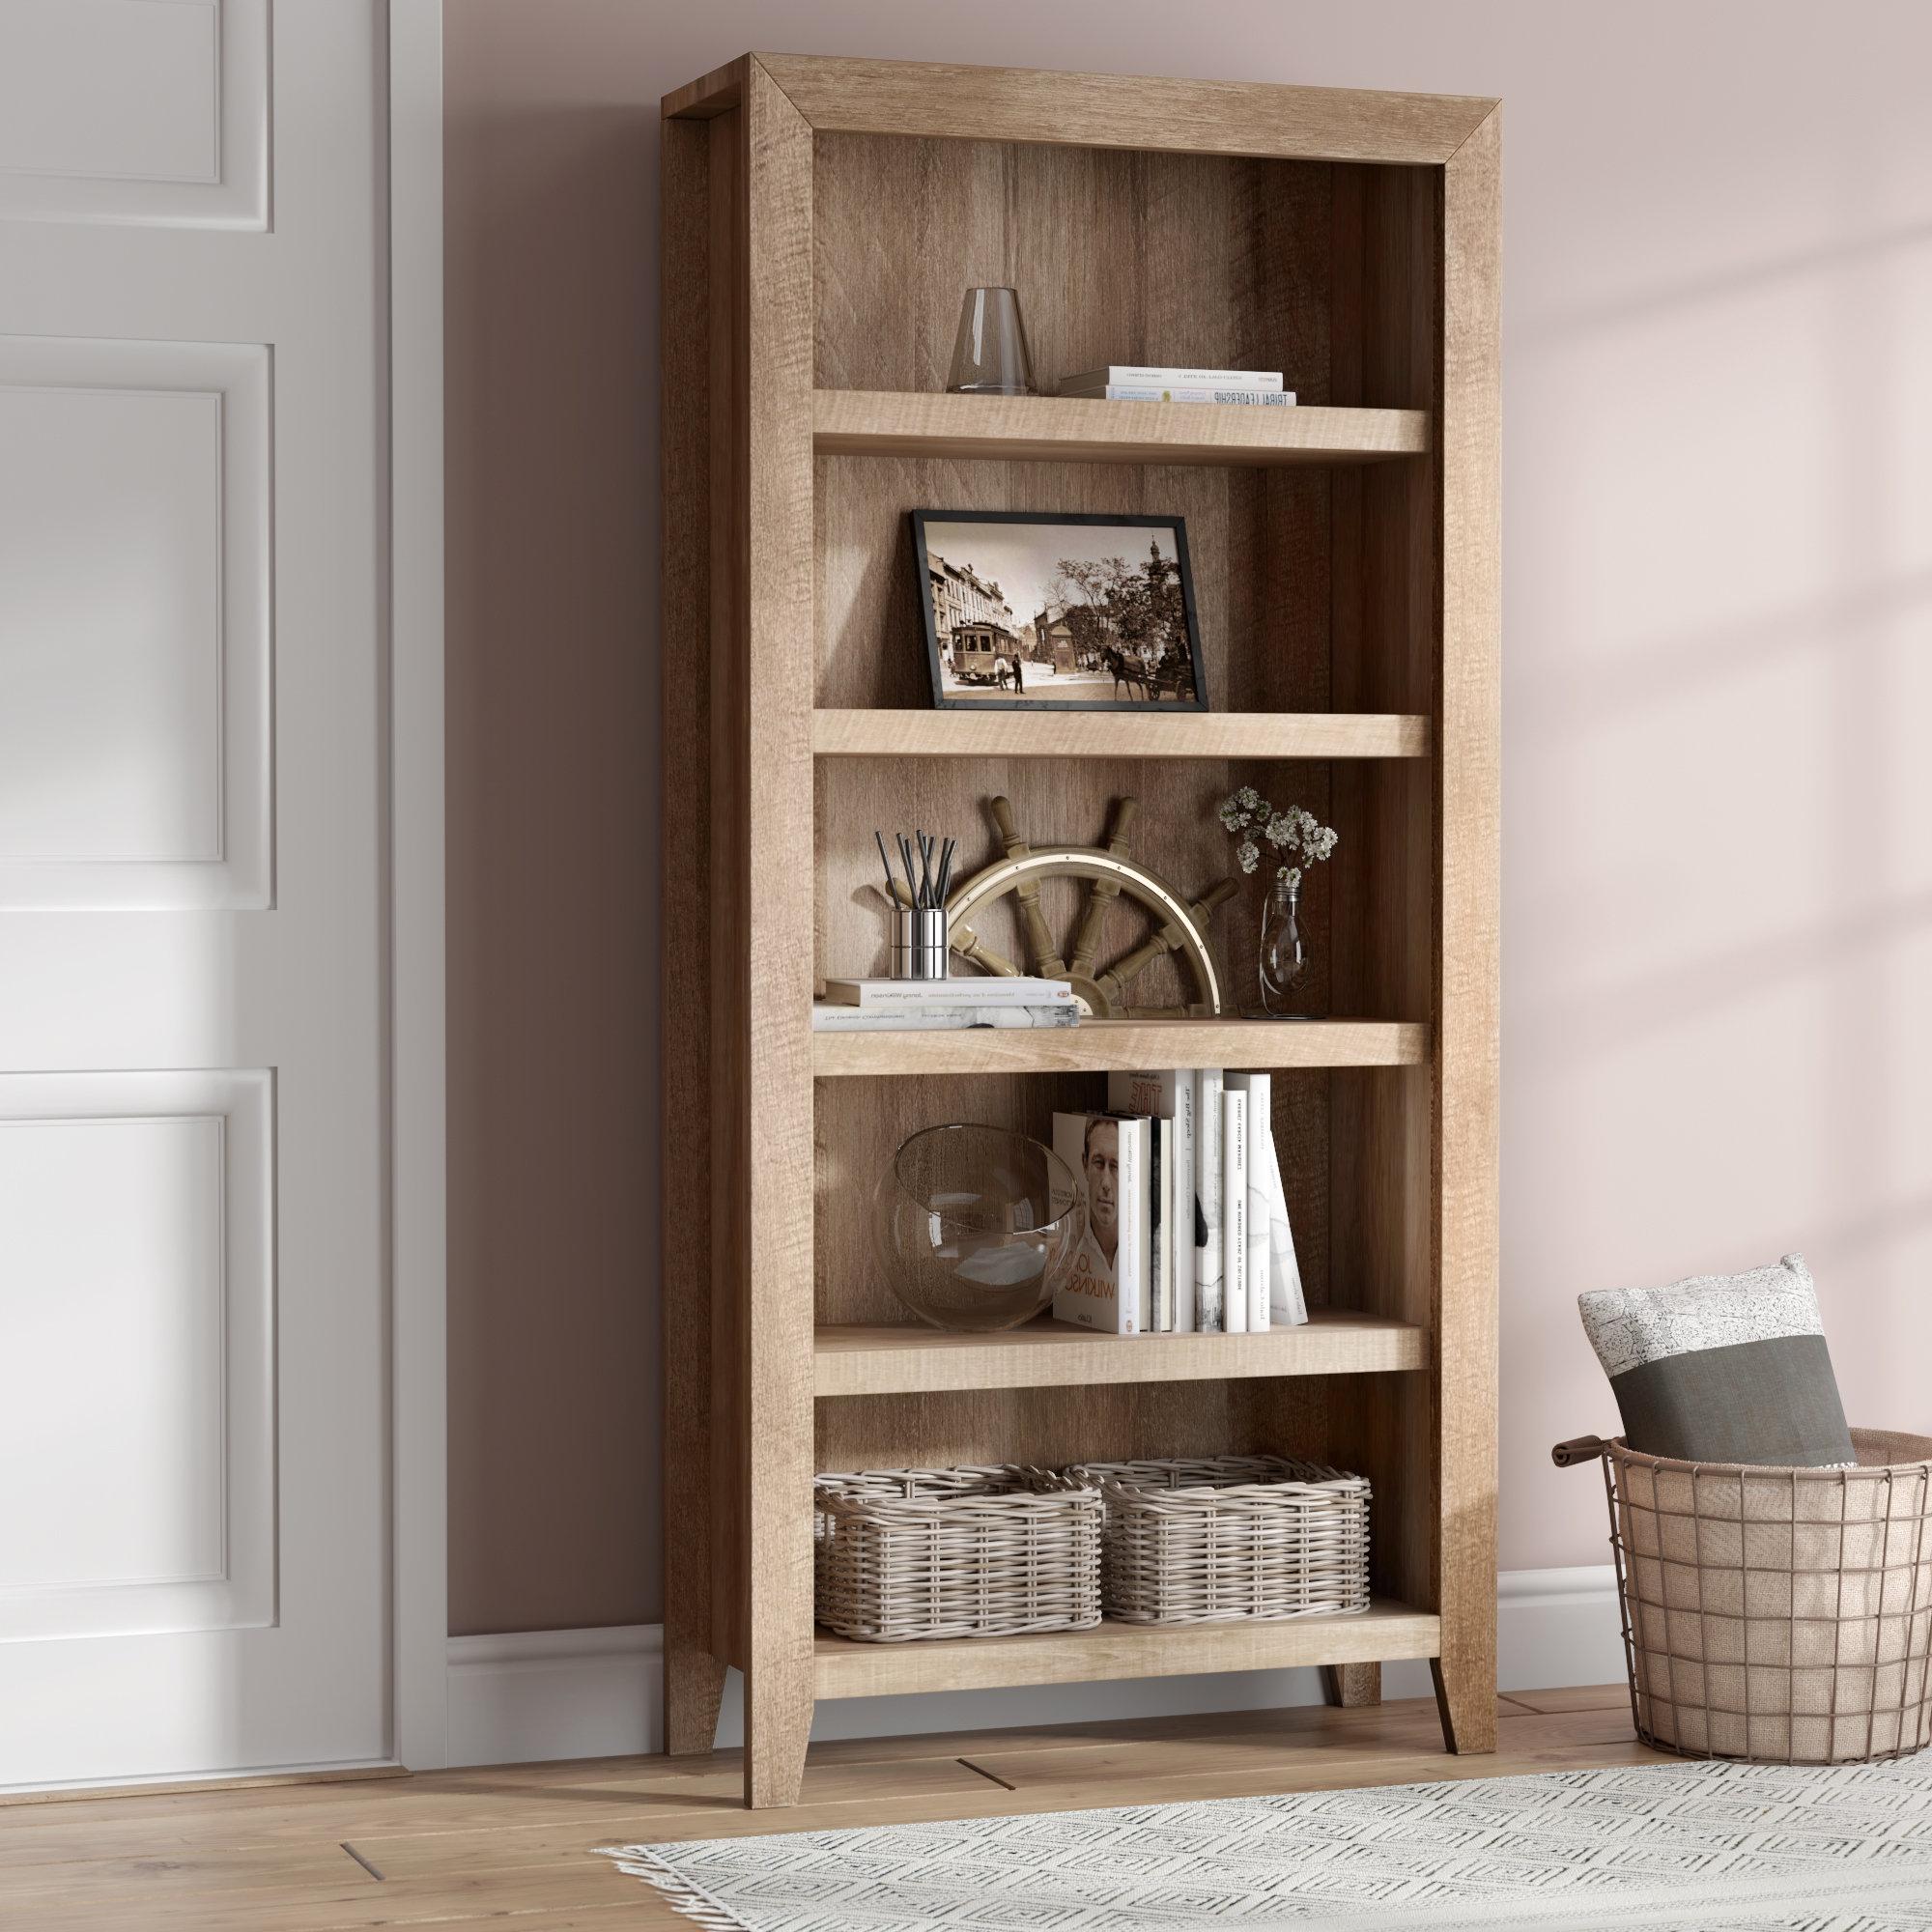 Wayfair Regarding Most Recent Mdb Standard Bookcases (View 18 of 20)